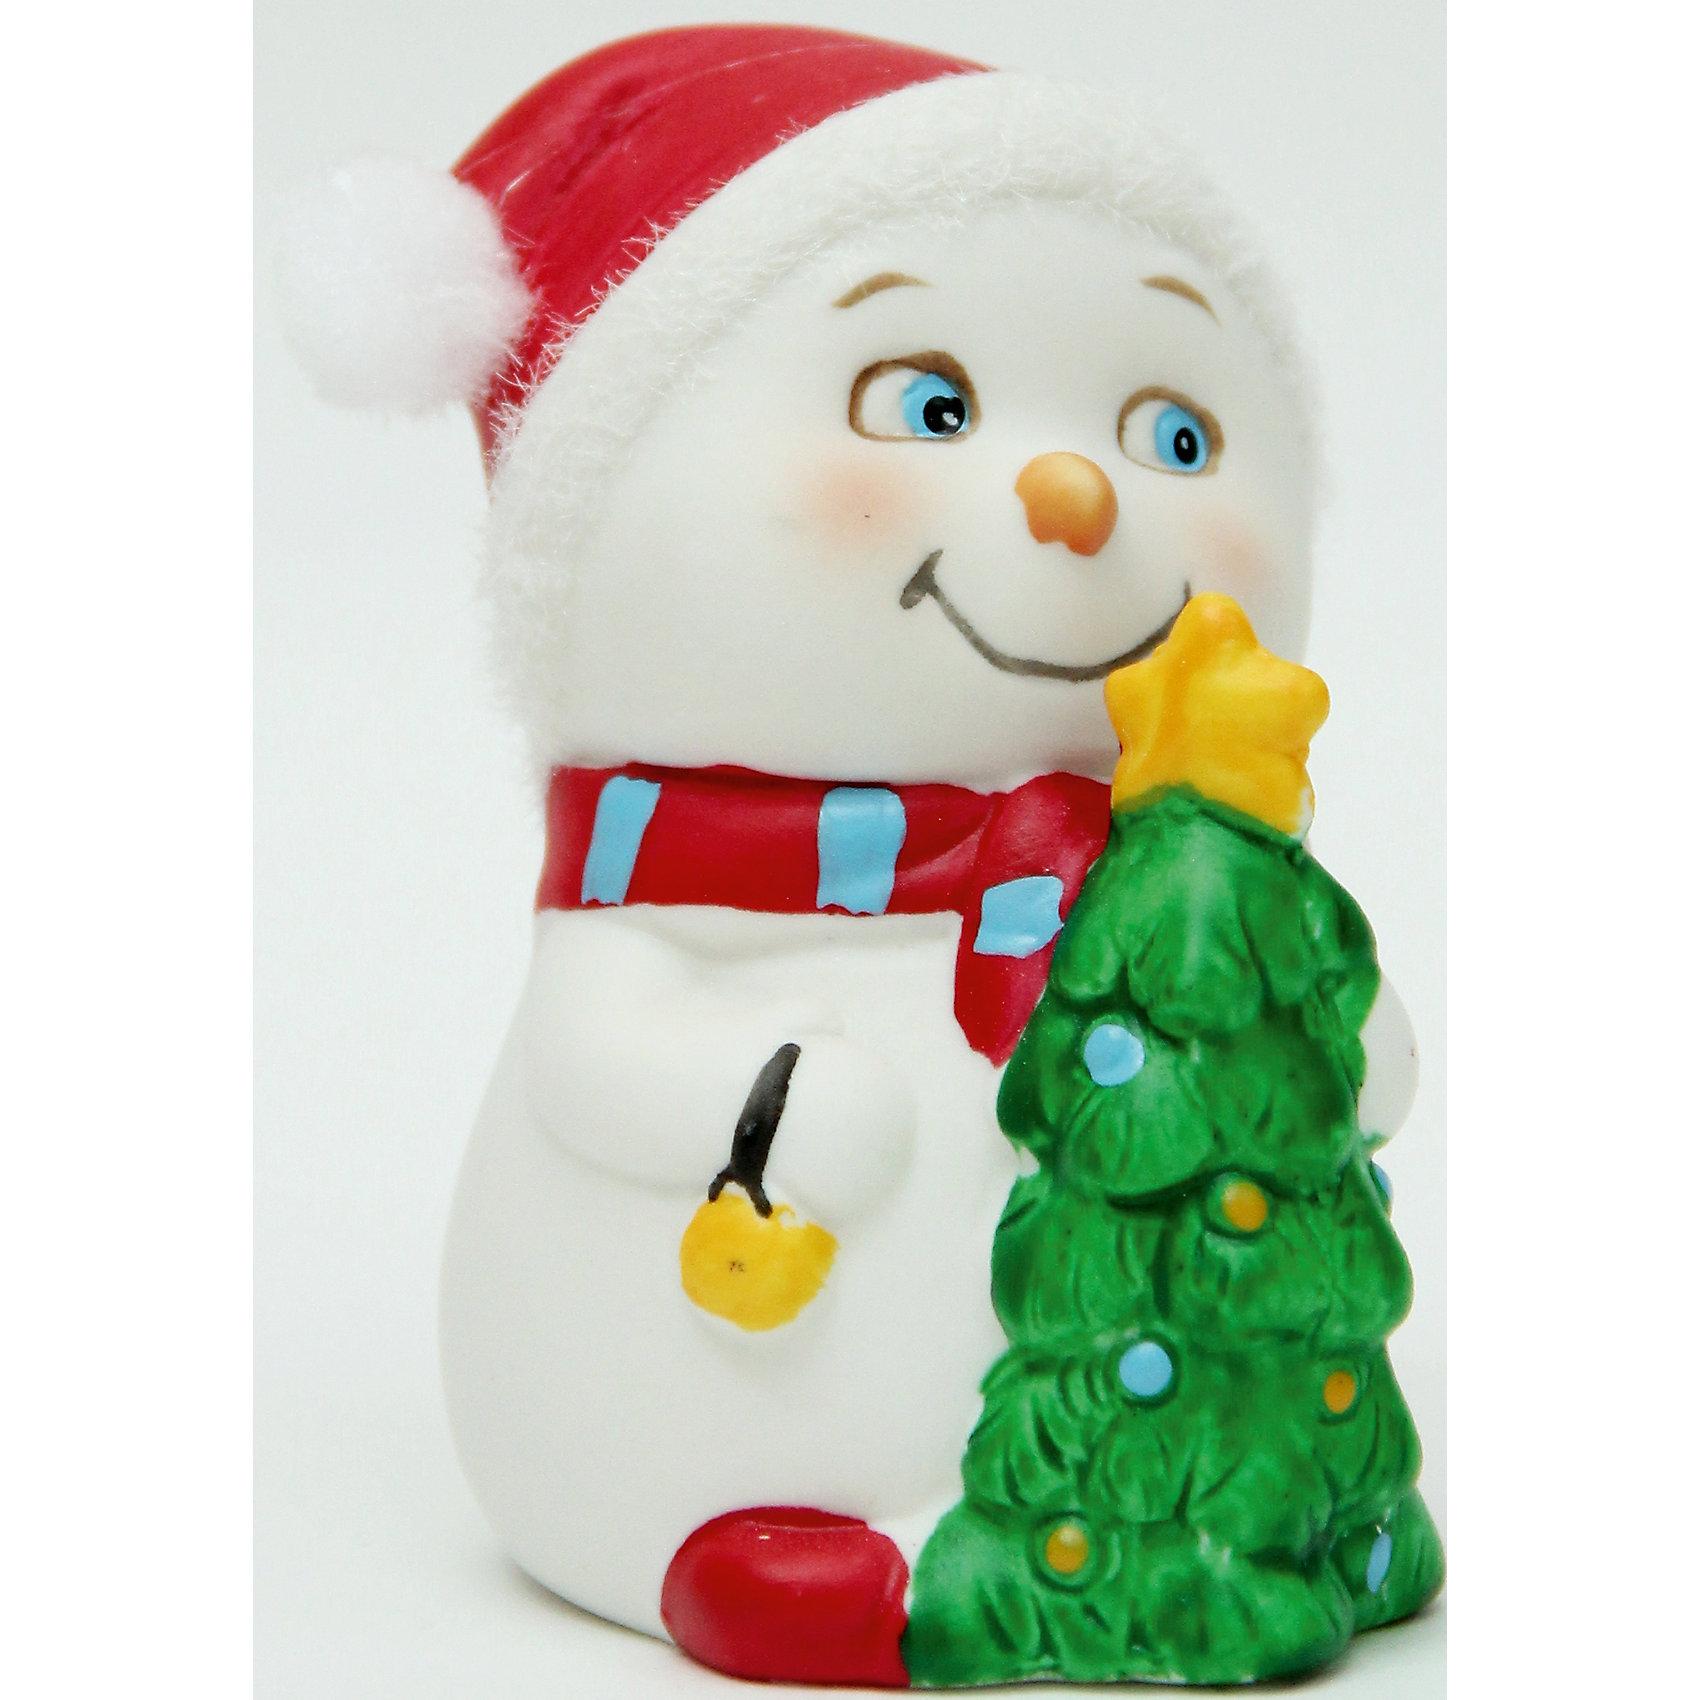 Фигурка Снеговик с елочкойВсё для праздника<br>Новогодняя фигурка снеговика Снеговик с елочкой арт.38345/120 (цв. карт.8см, керамика)<br><br>Ширина мм: 80<br>Глубина мм: 70<br>Высота мм: 90<br>Вес г: 138<br>Возраст от месяцев: 60<br>Возраст до месяцев: 600<br>Пол: Унисекс<br>Возраст: Детский<br>SKU: 5144562